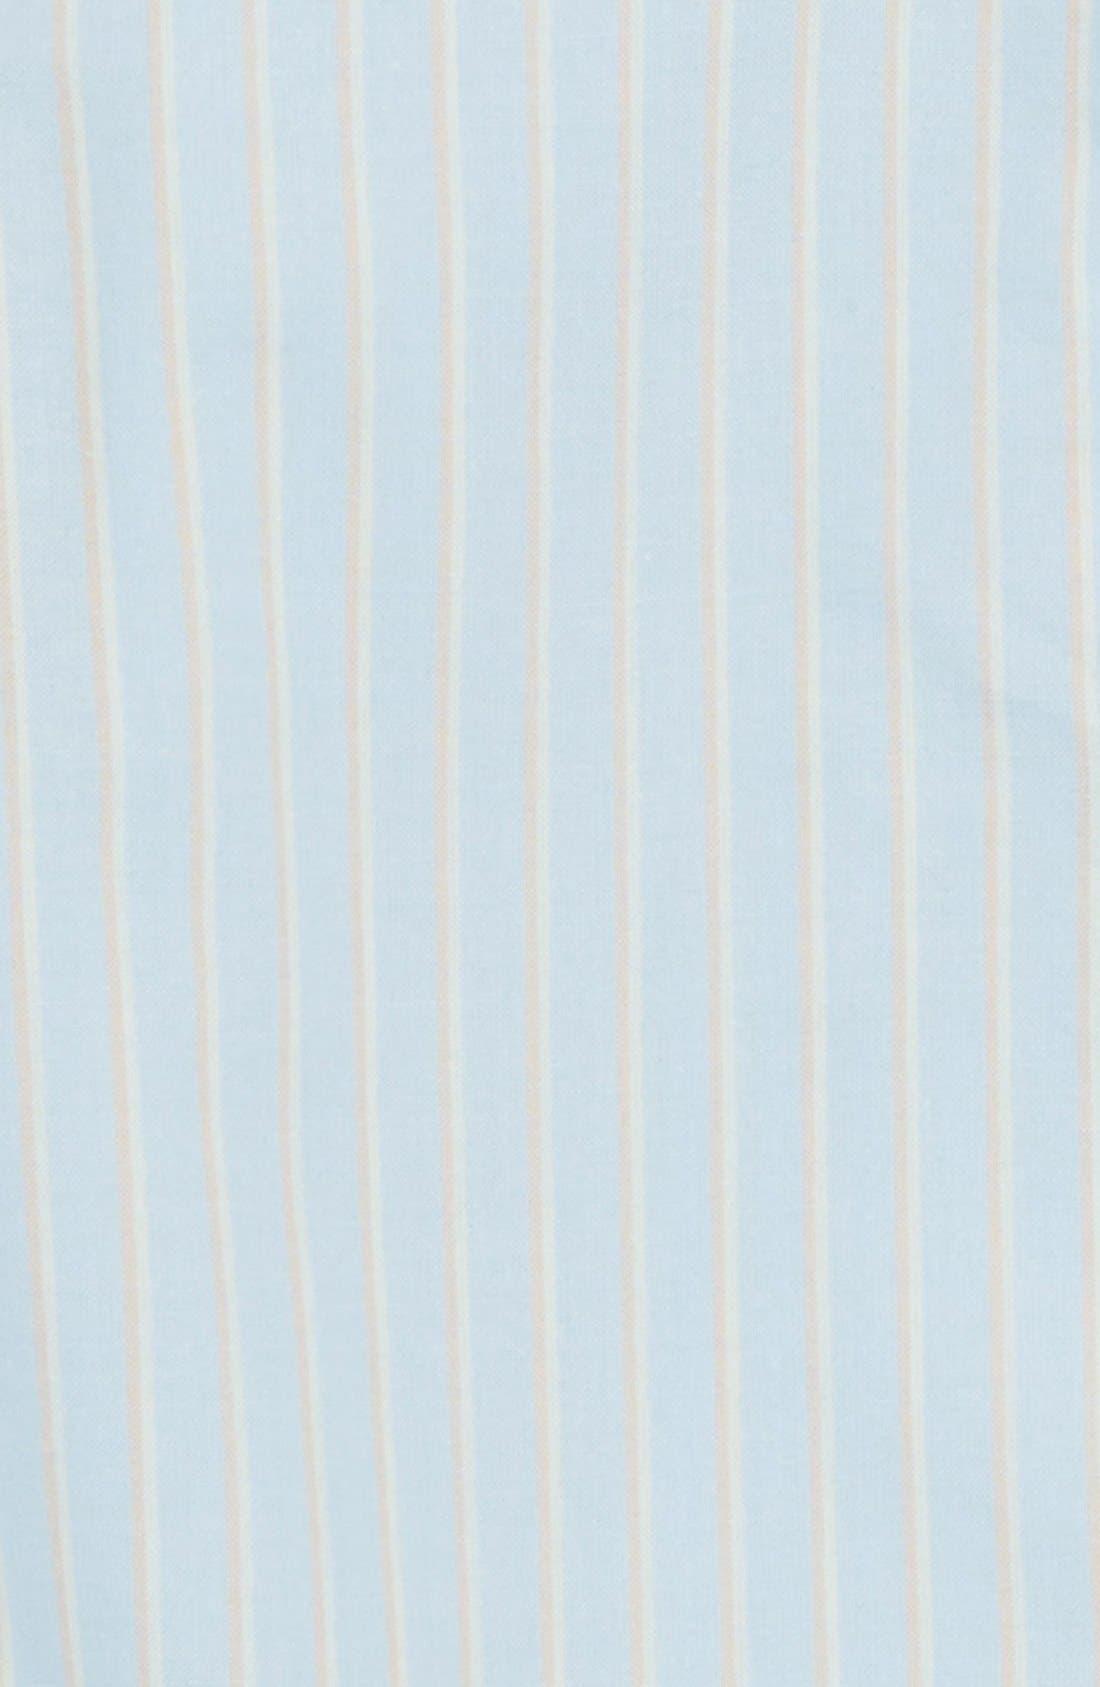 Alternate Image 2  - Quiksilver 'Barracuda Cay' Short Sleeve Woven Shirt (Little Boys & Big Boys)